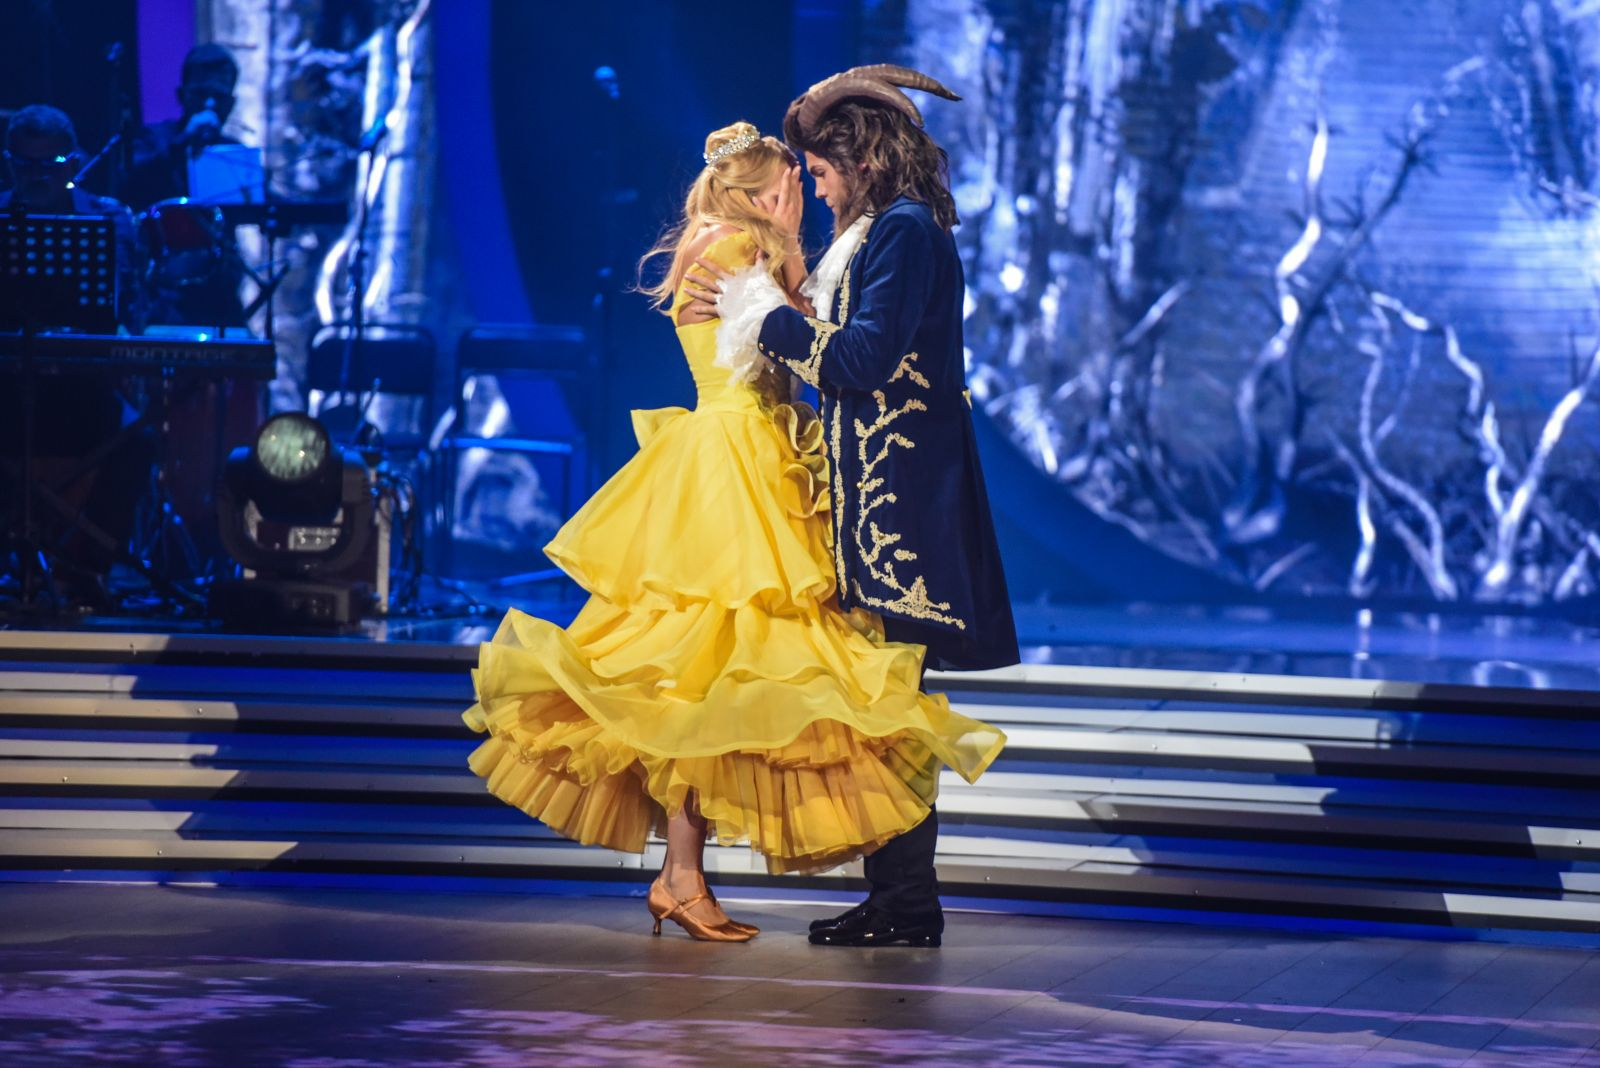 От ненависти до любви – один танец: Оля Полякова призналась в любви Екатерине Кухар